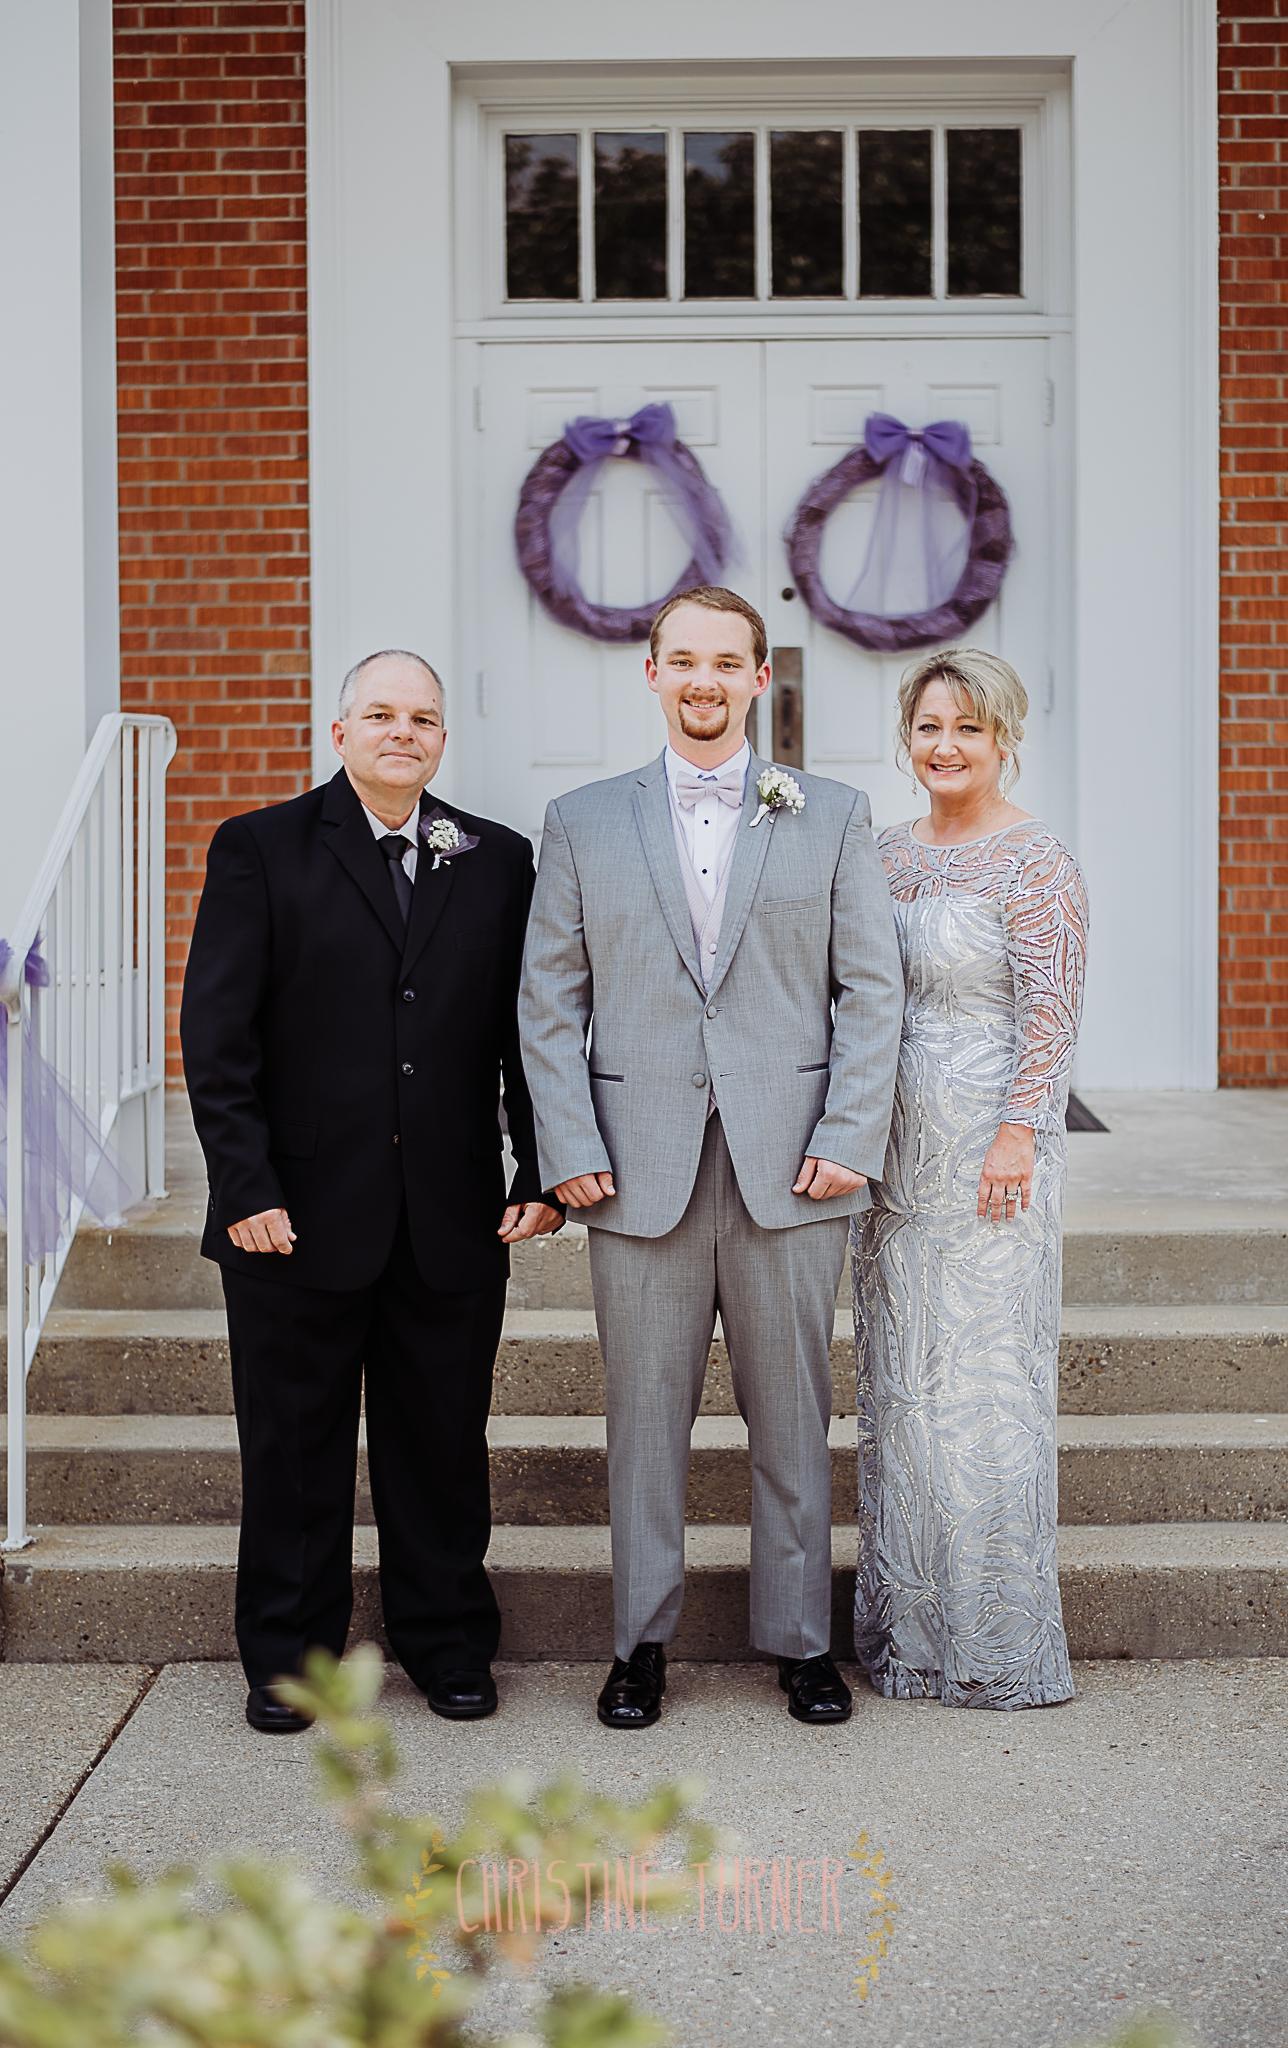 Johnston Wedding (3 of 4)